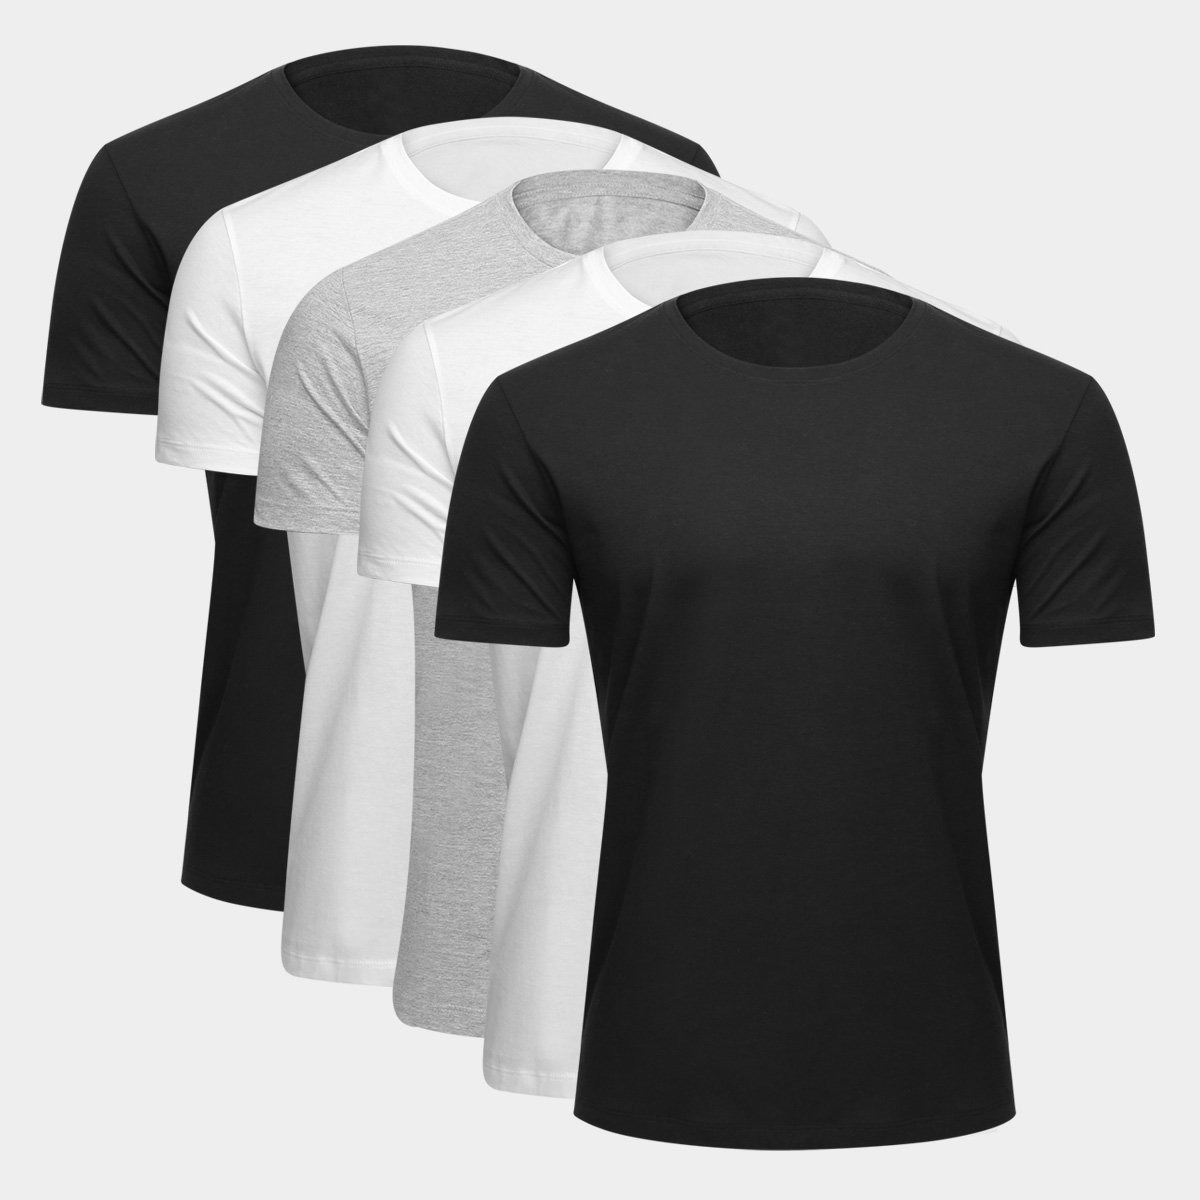 Kit Camiseta Básica c/ 5 Peças Masculina - Preto e Branco